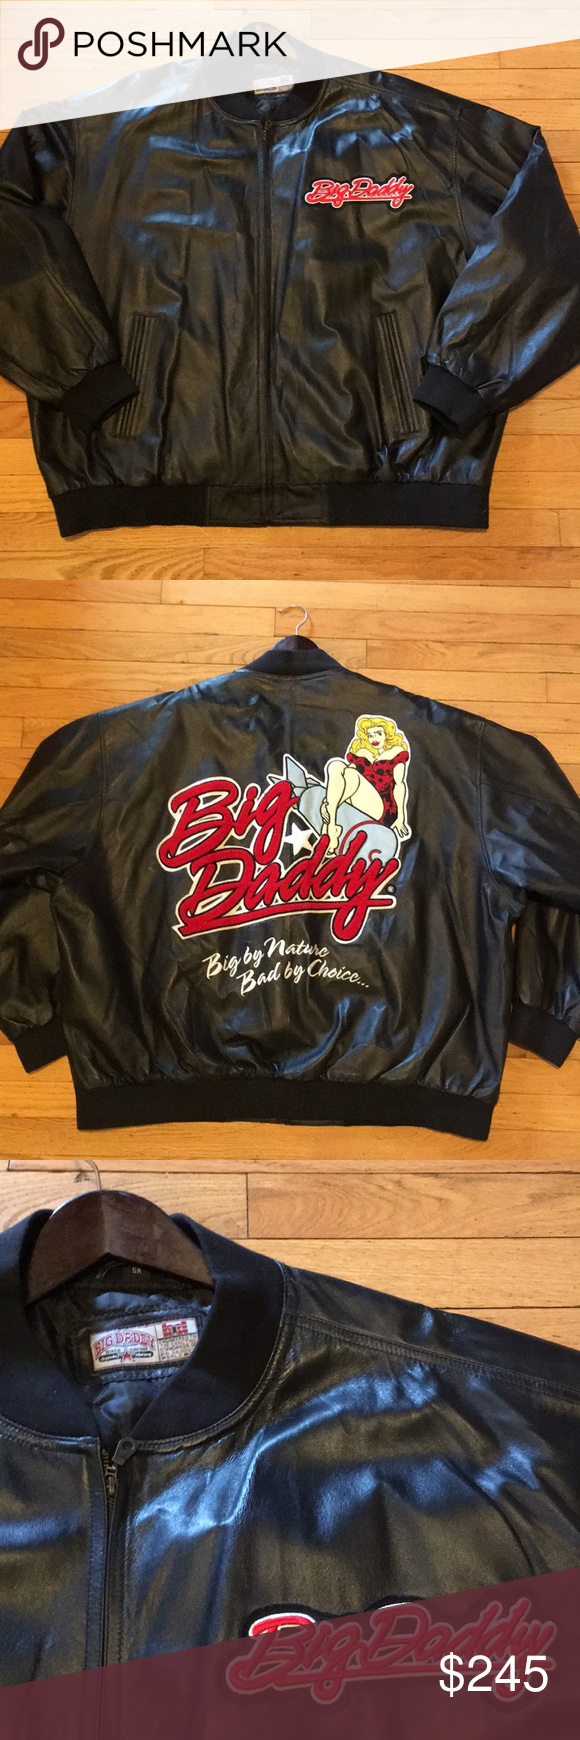 Big Daddy Special Edition 5xl Leather Jacket Leather Jacket Leather Jacket Black Jackets [ 1740 x 580 Pixel ]